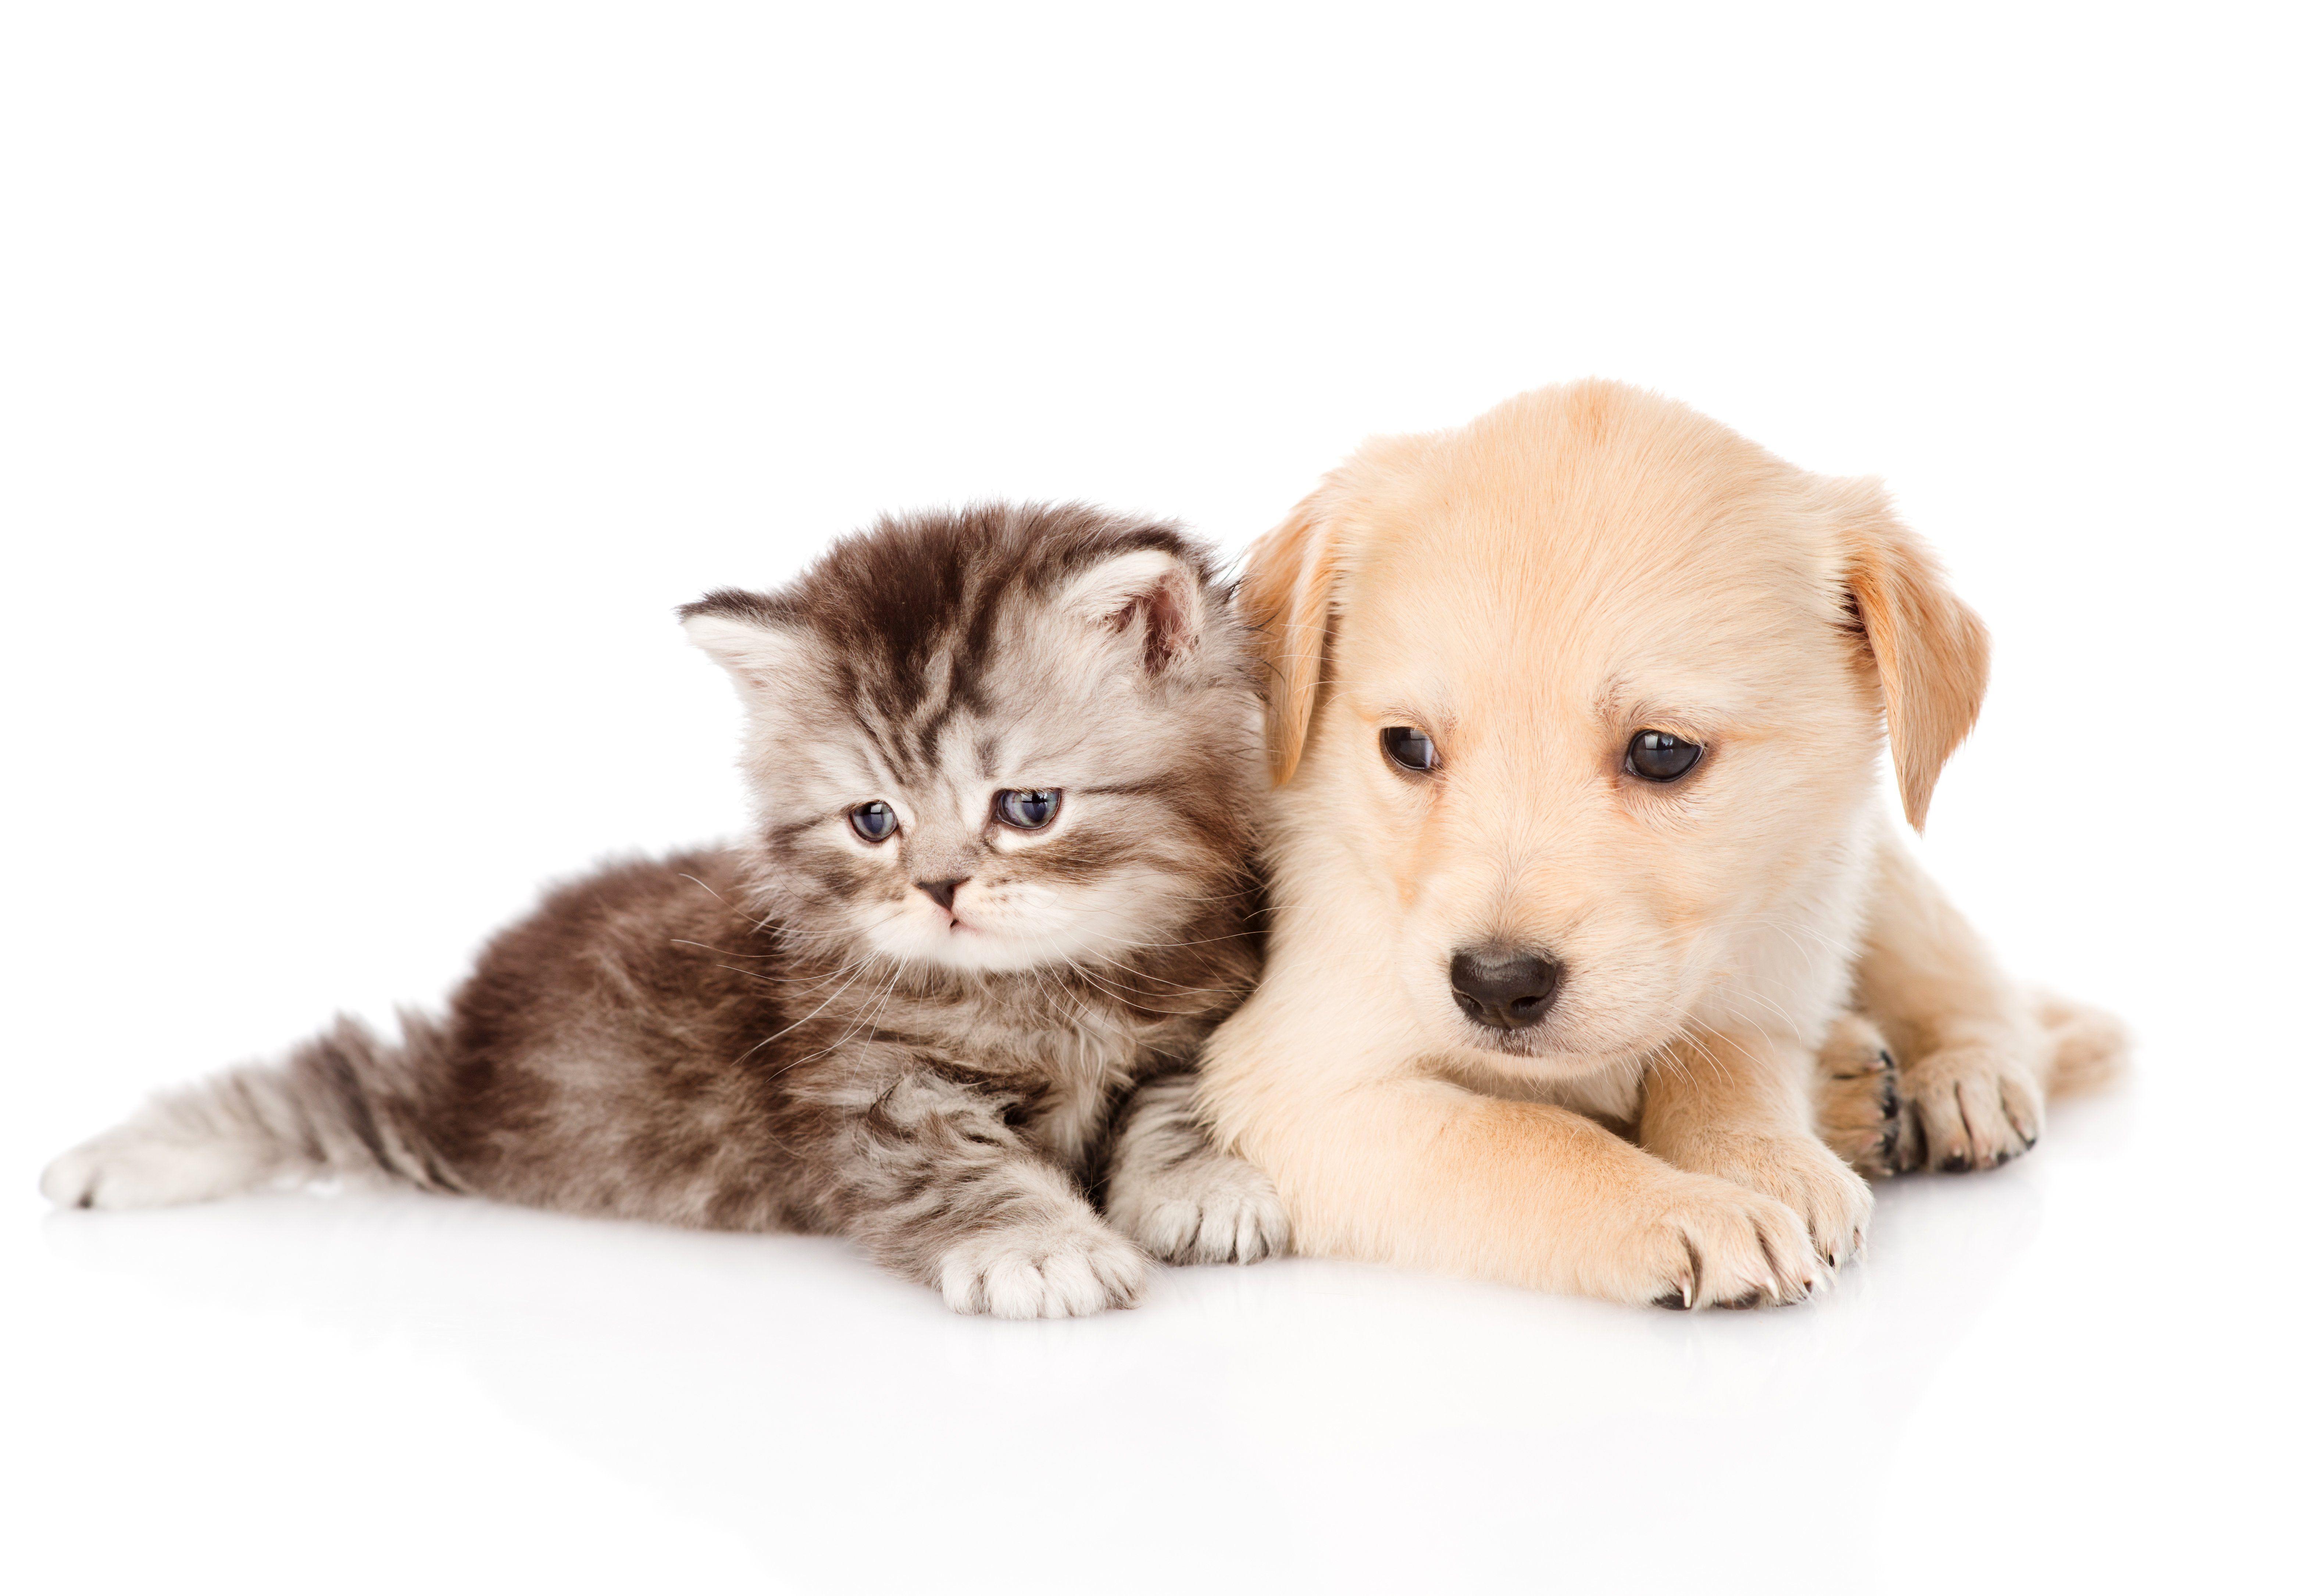 Dog And Cat Wallpaper High Quality Resolution For Desktop 6256 X 4341 Px 797 MB Pattern Tumblr Bone 1920x1080 Black White